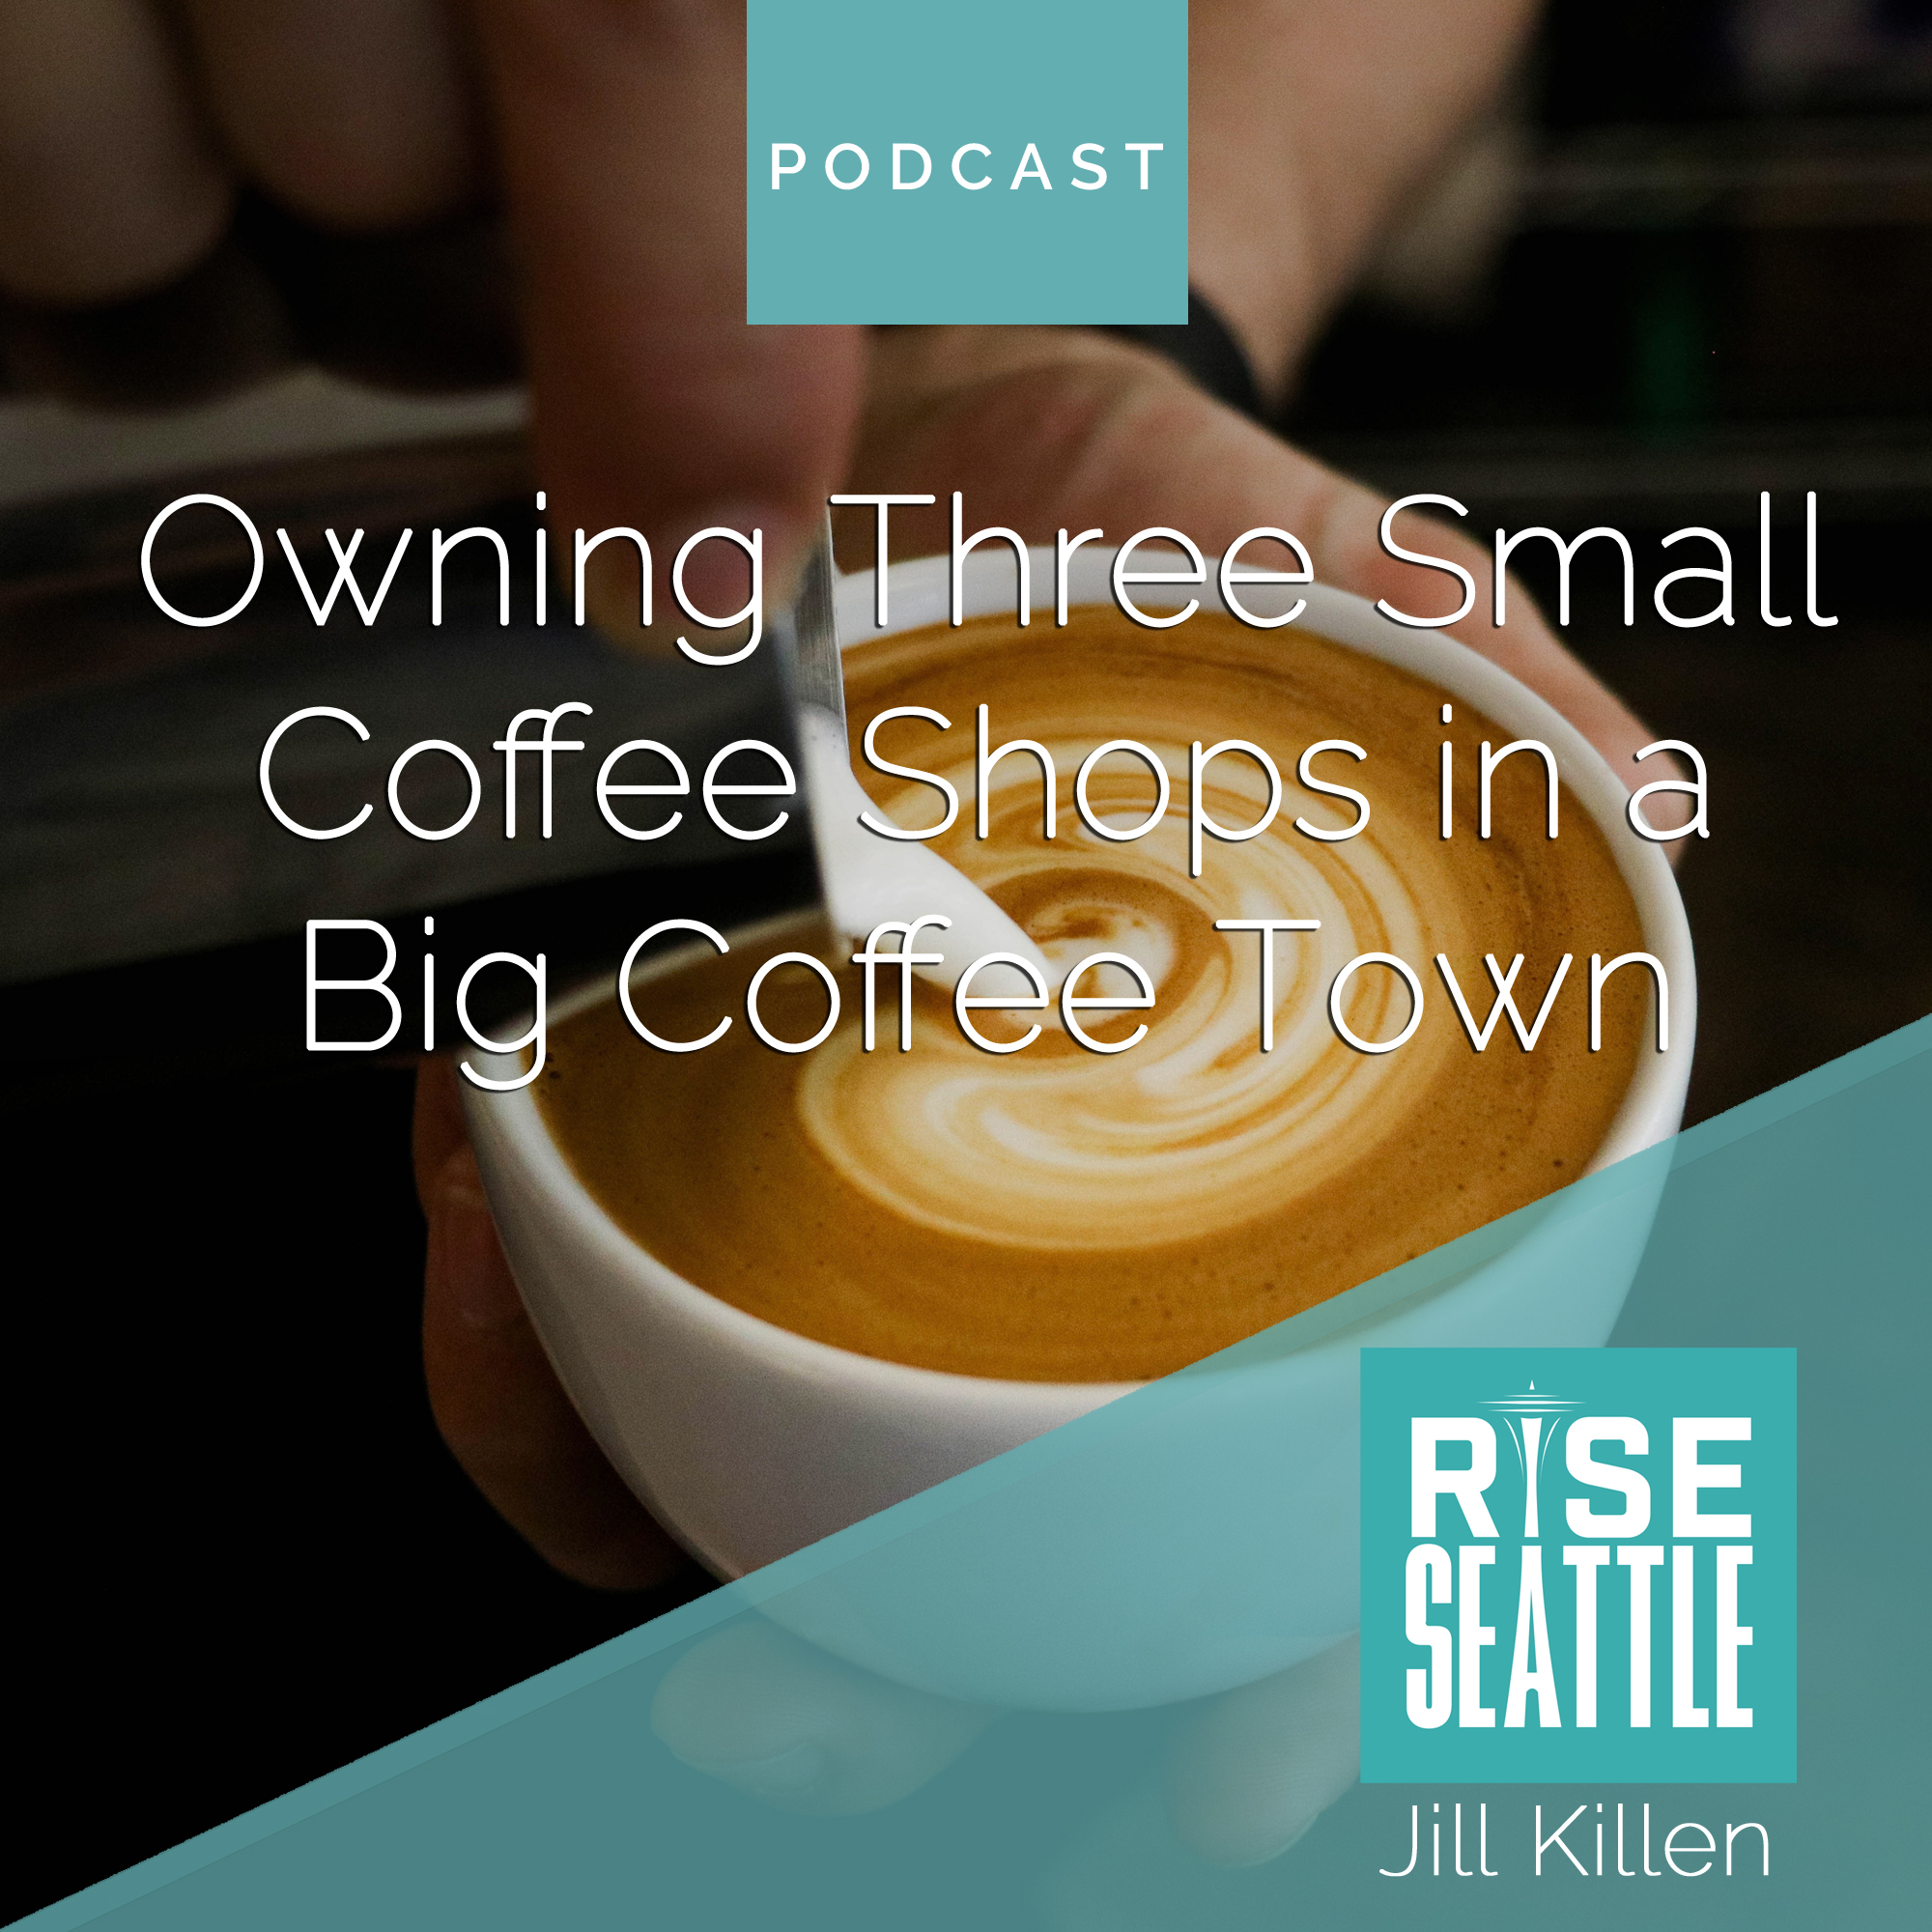 S1.E8. Jill Killen: Running Three Small Coffee Shops in a Big Coffee Town